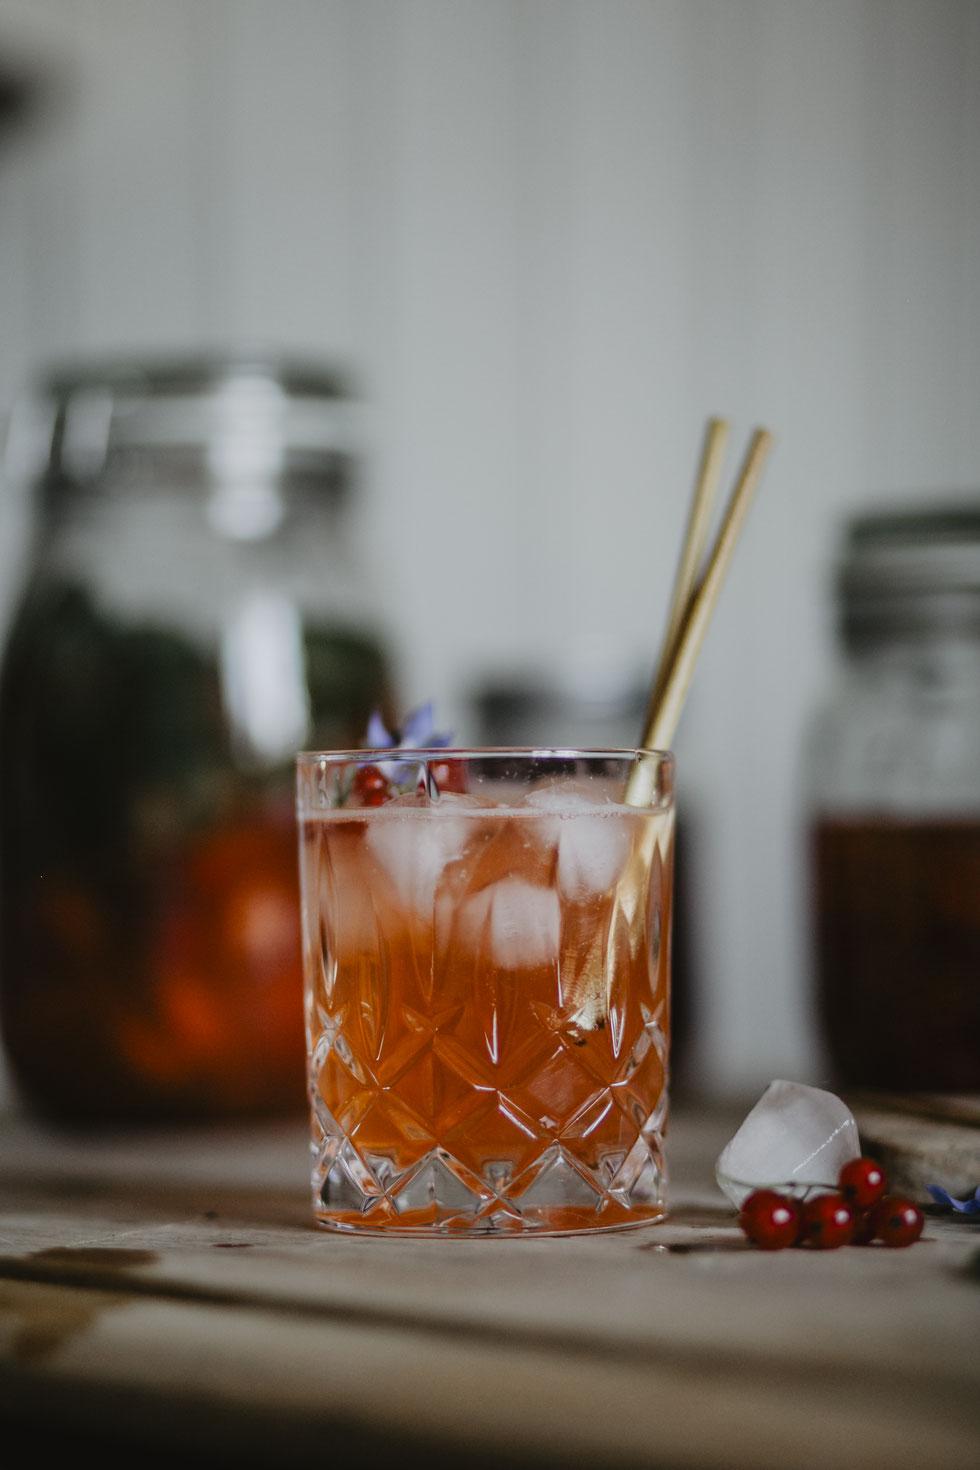 Botanik zum Trinken - Johannisbeer Shrub